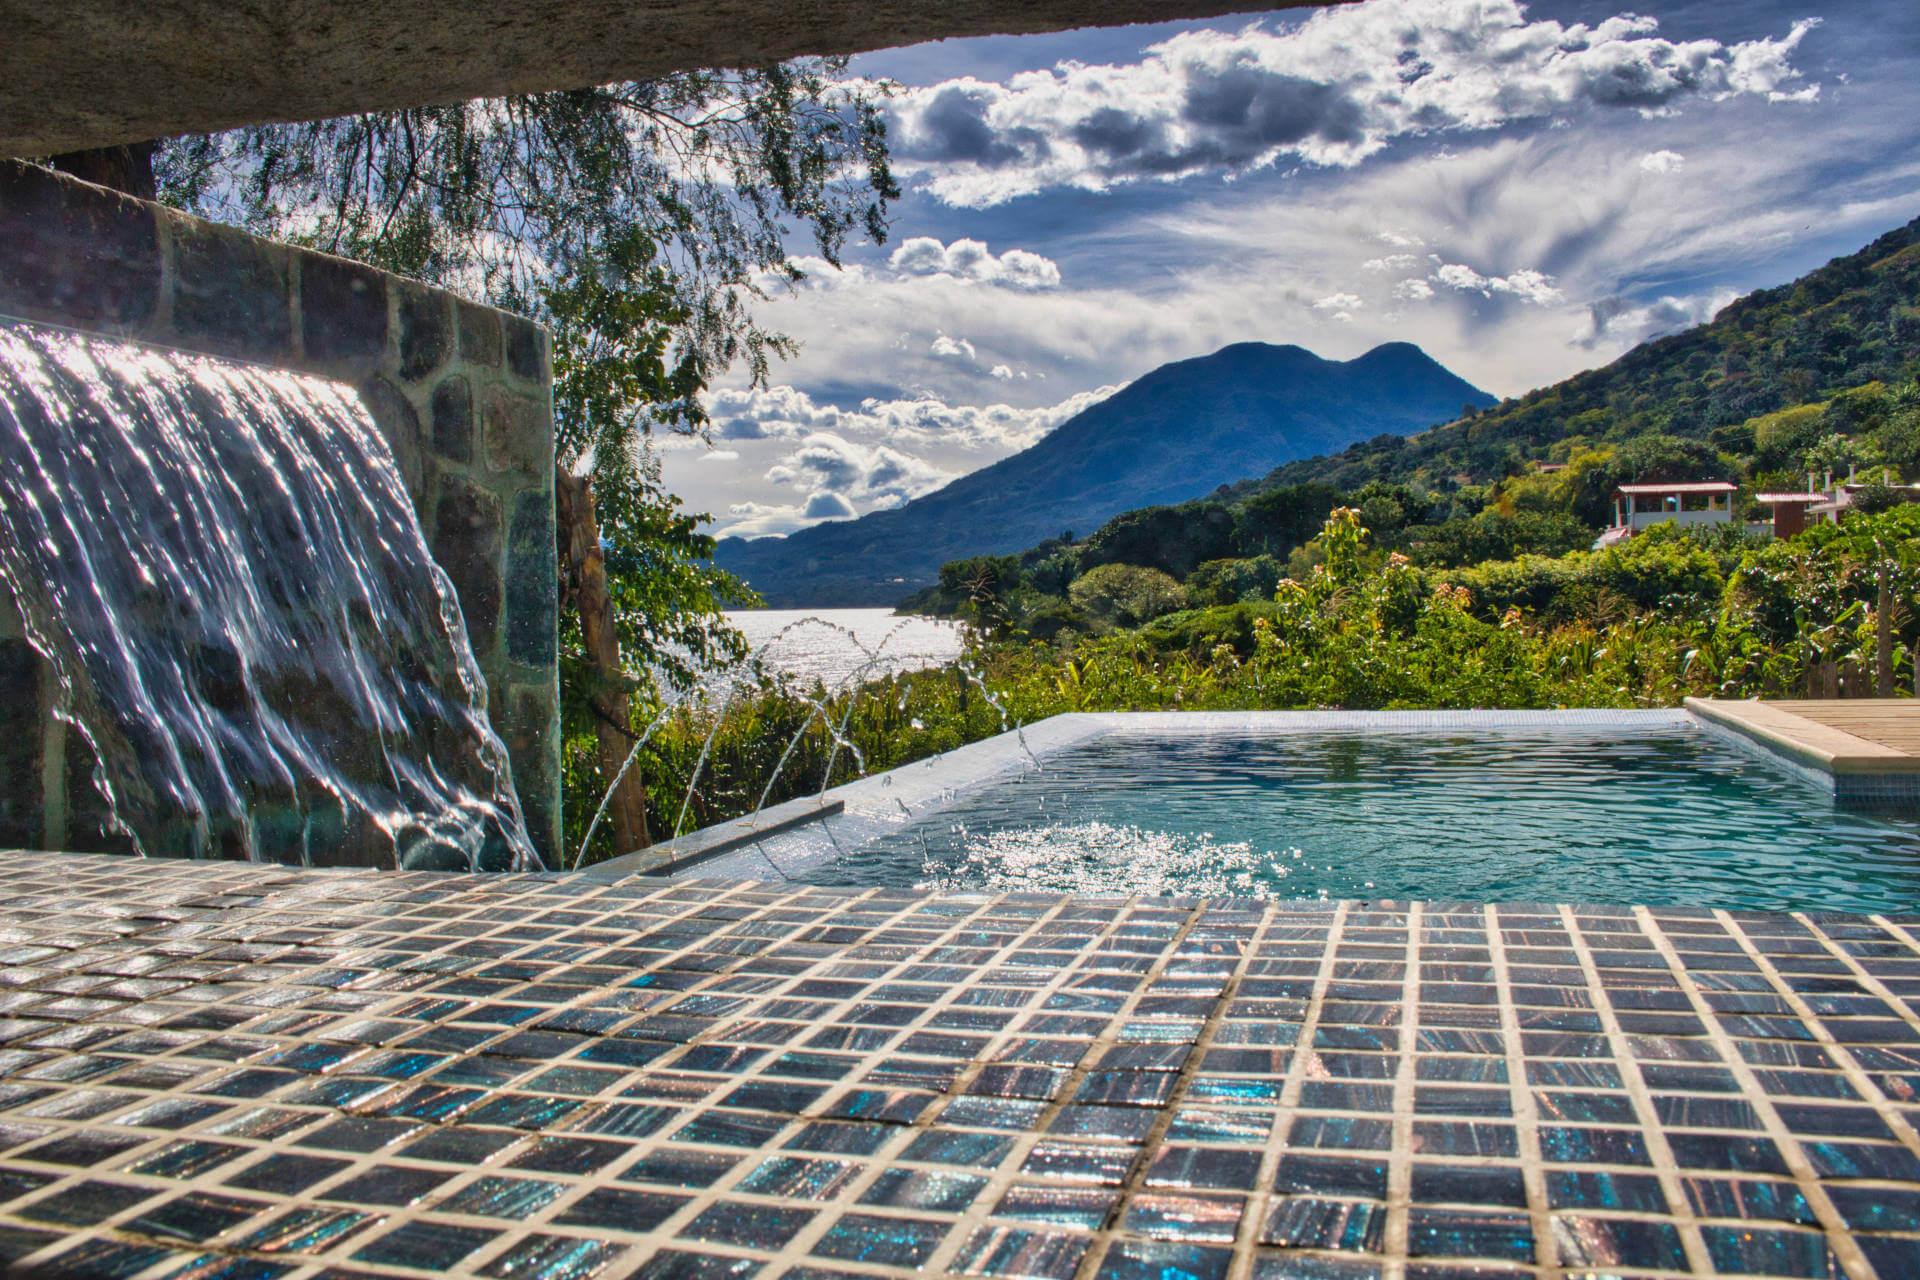 The Casa Lobo Bungalows Sauna is located in San Pedro la Laguna at the Lake Atitlán in Guatemala.